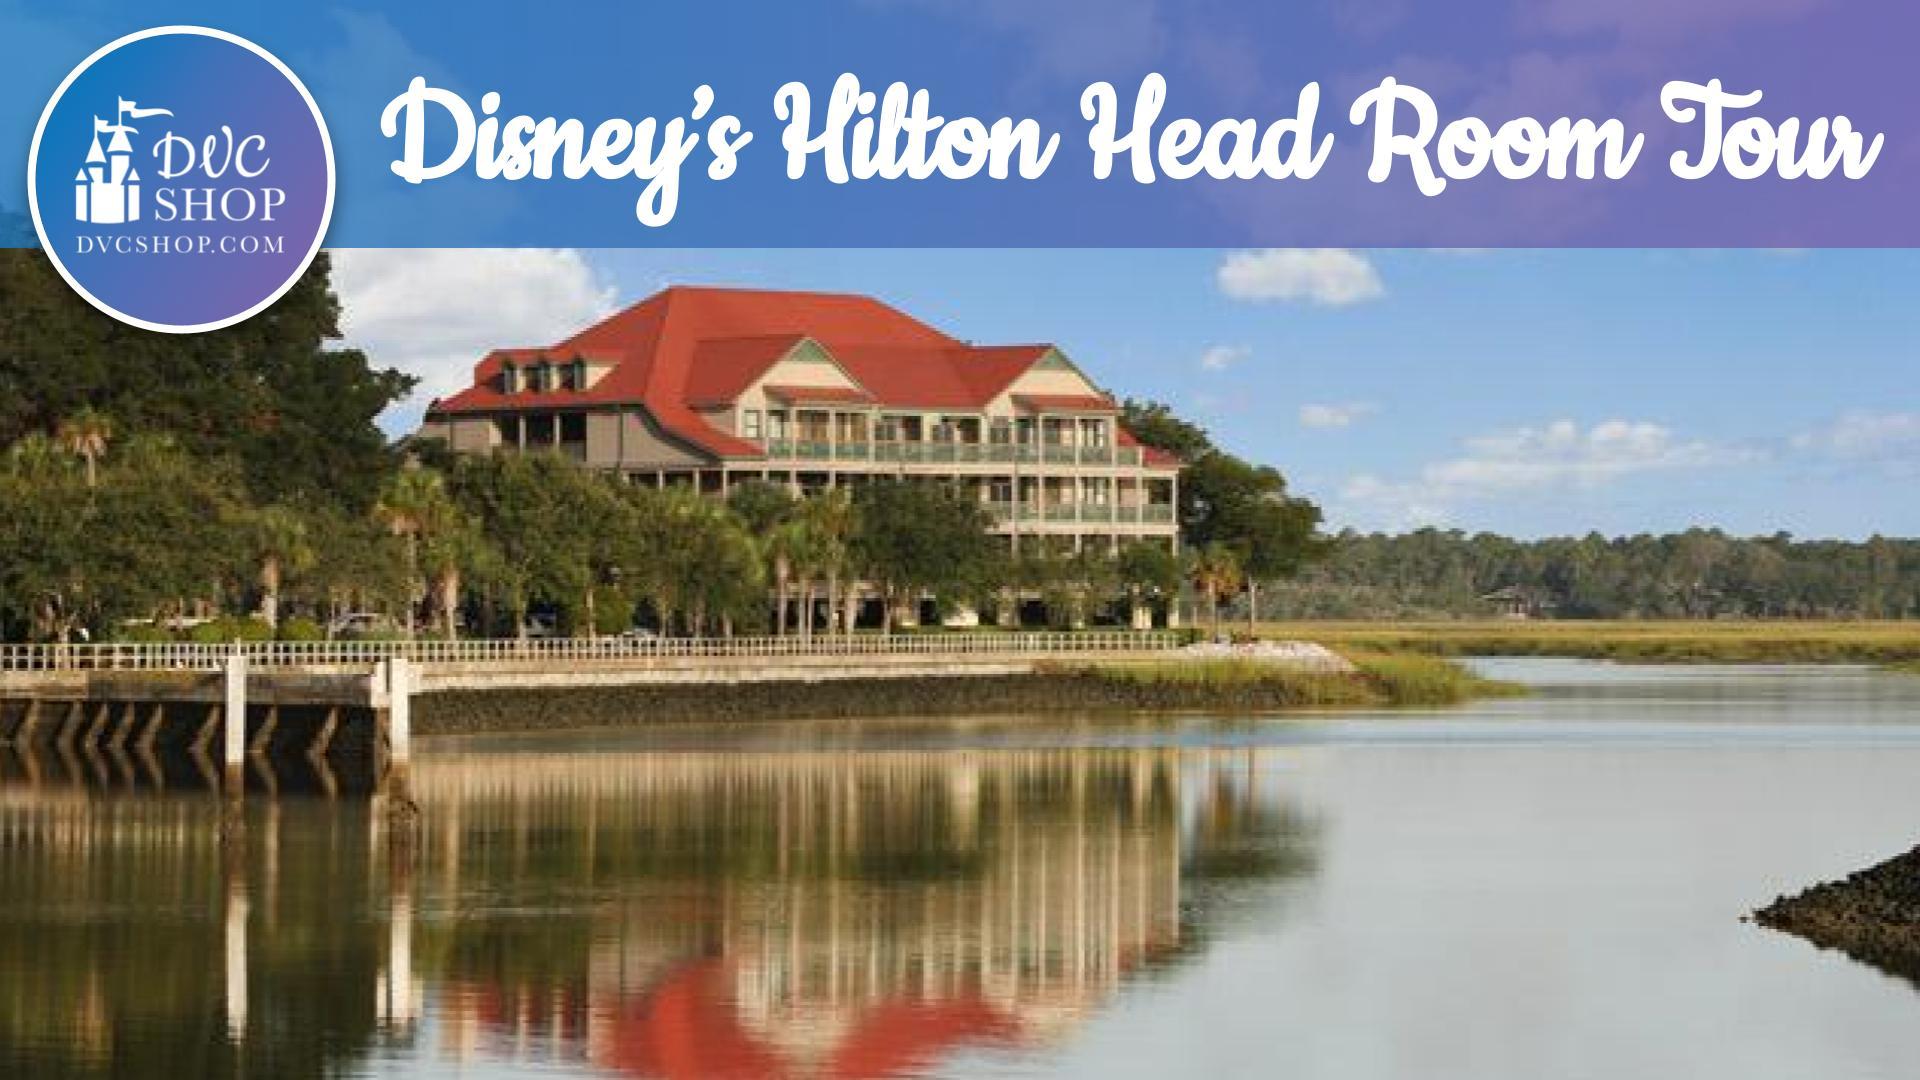 Disney Hilton Head Island Resort 1 Bedroom Room Tour